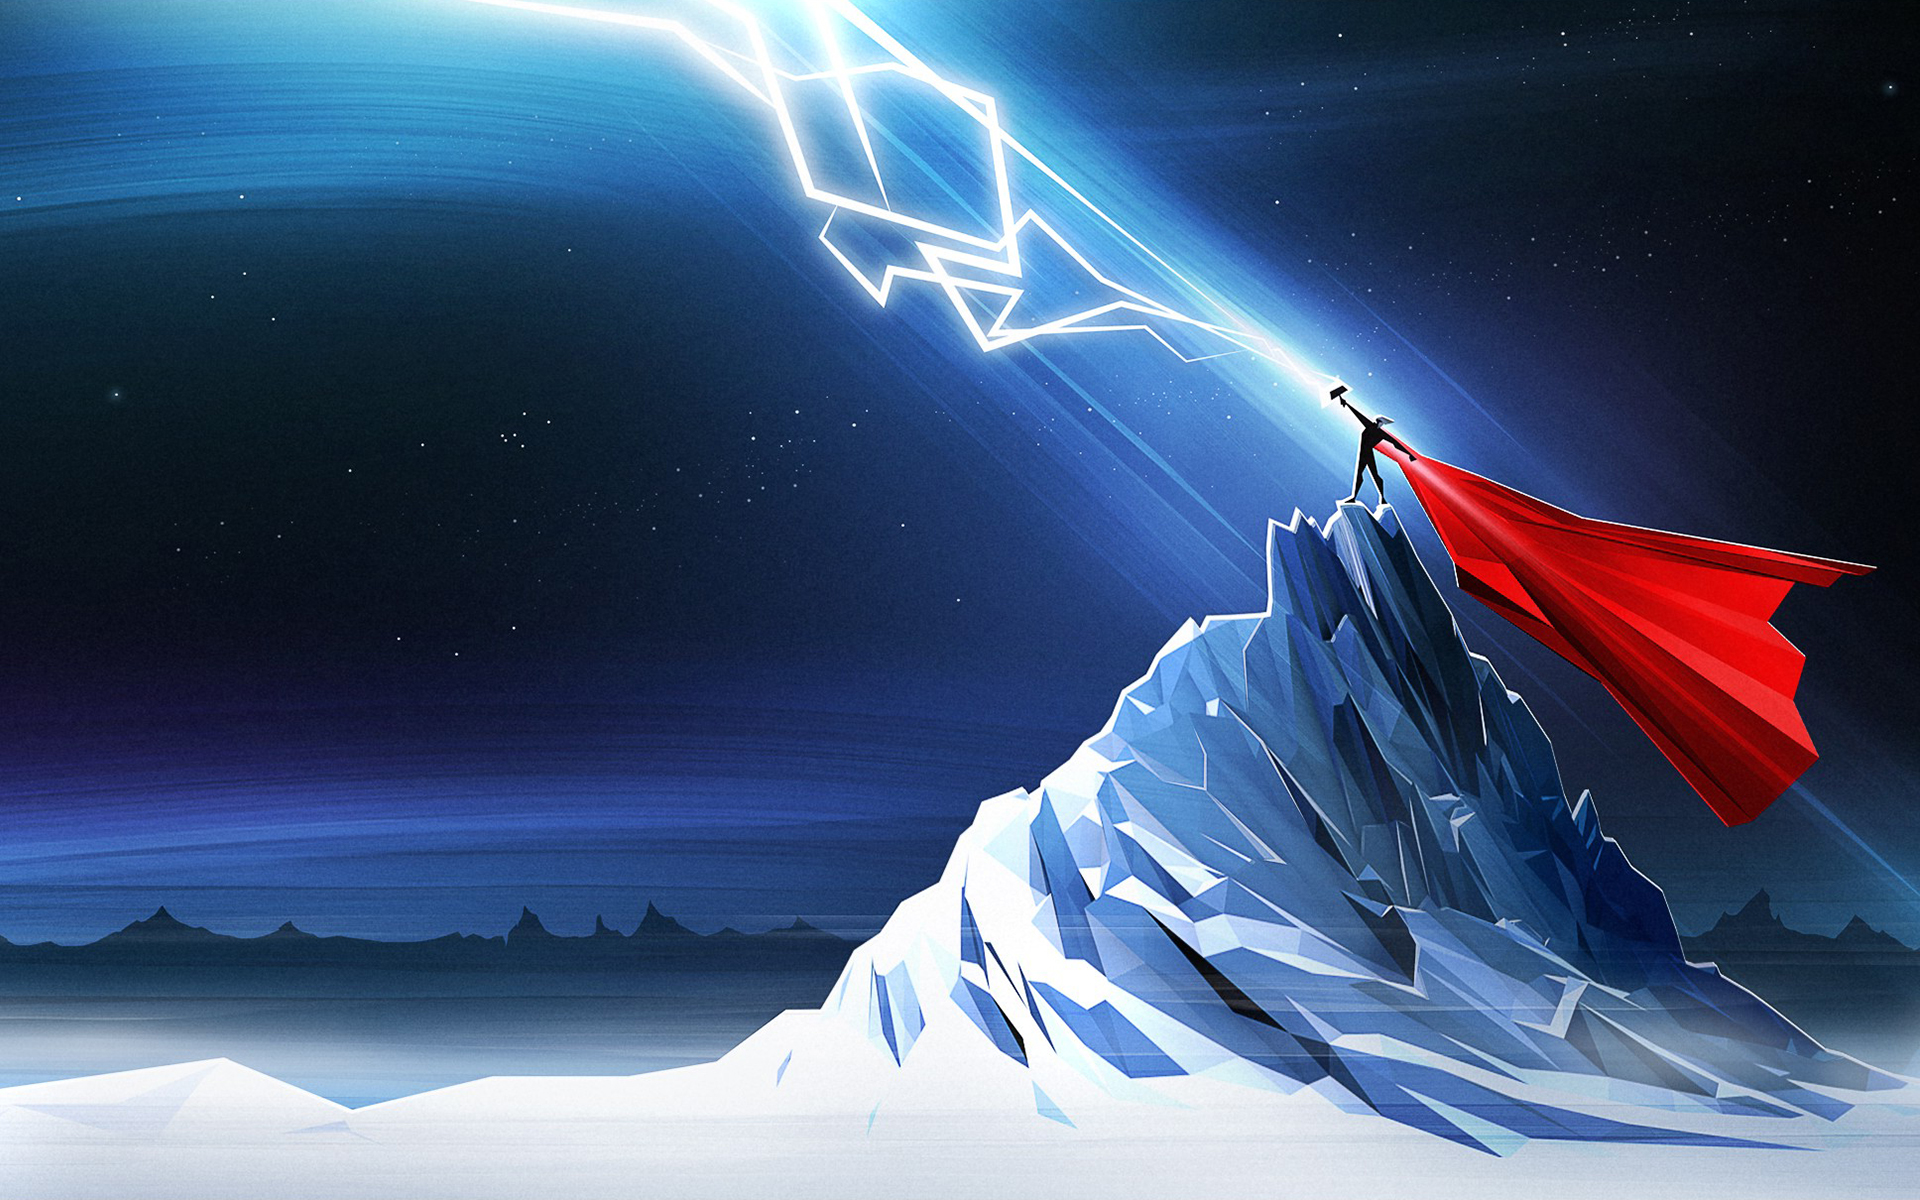 Thor lightning art